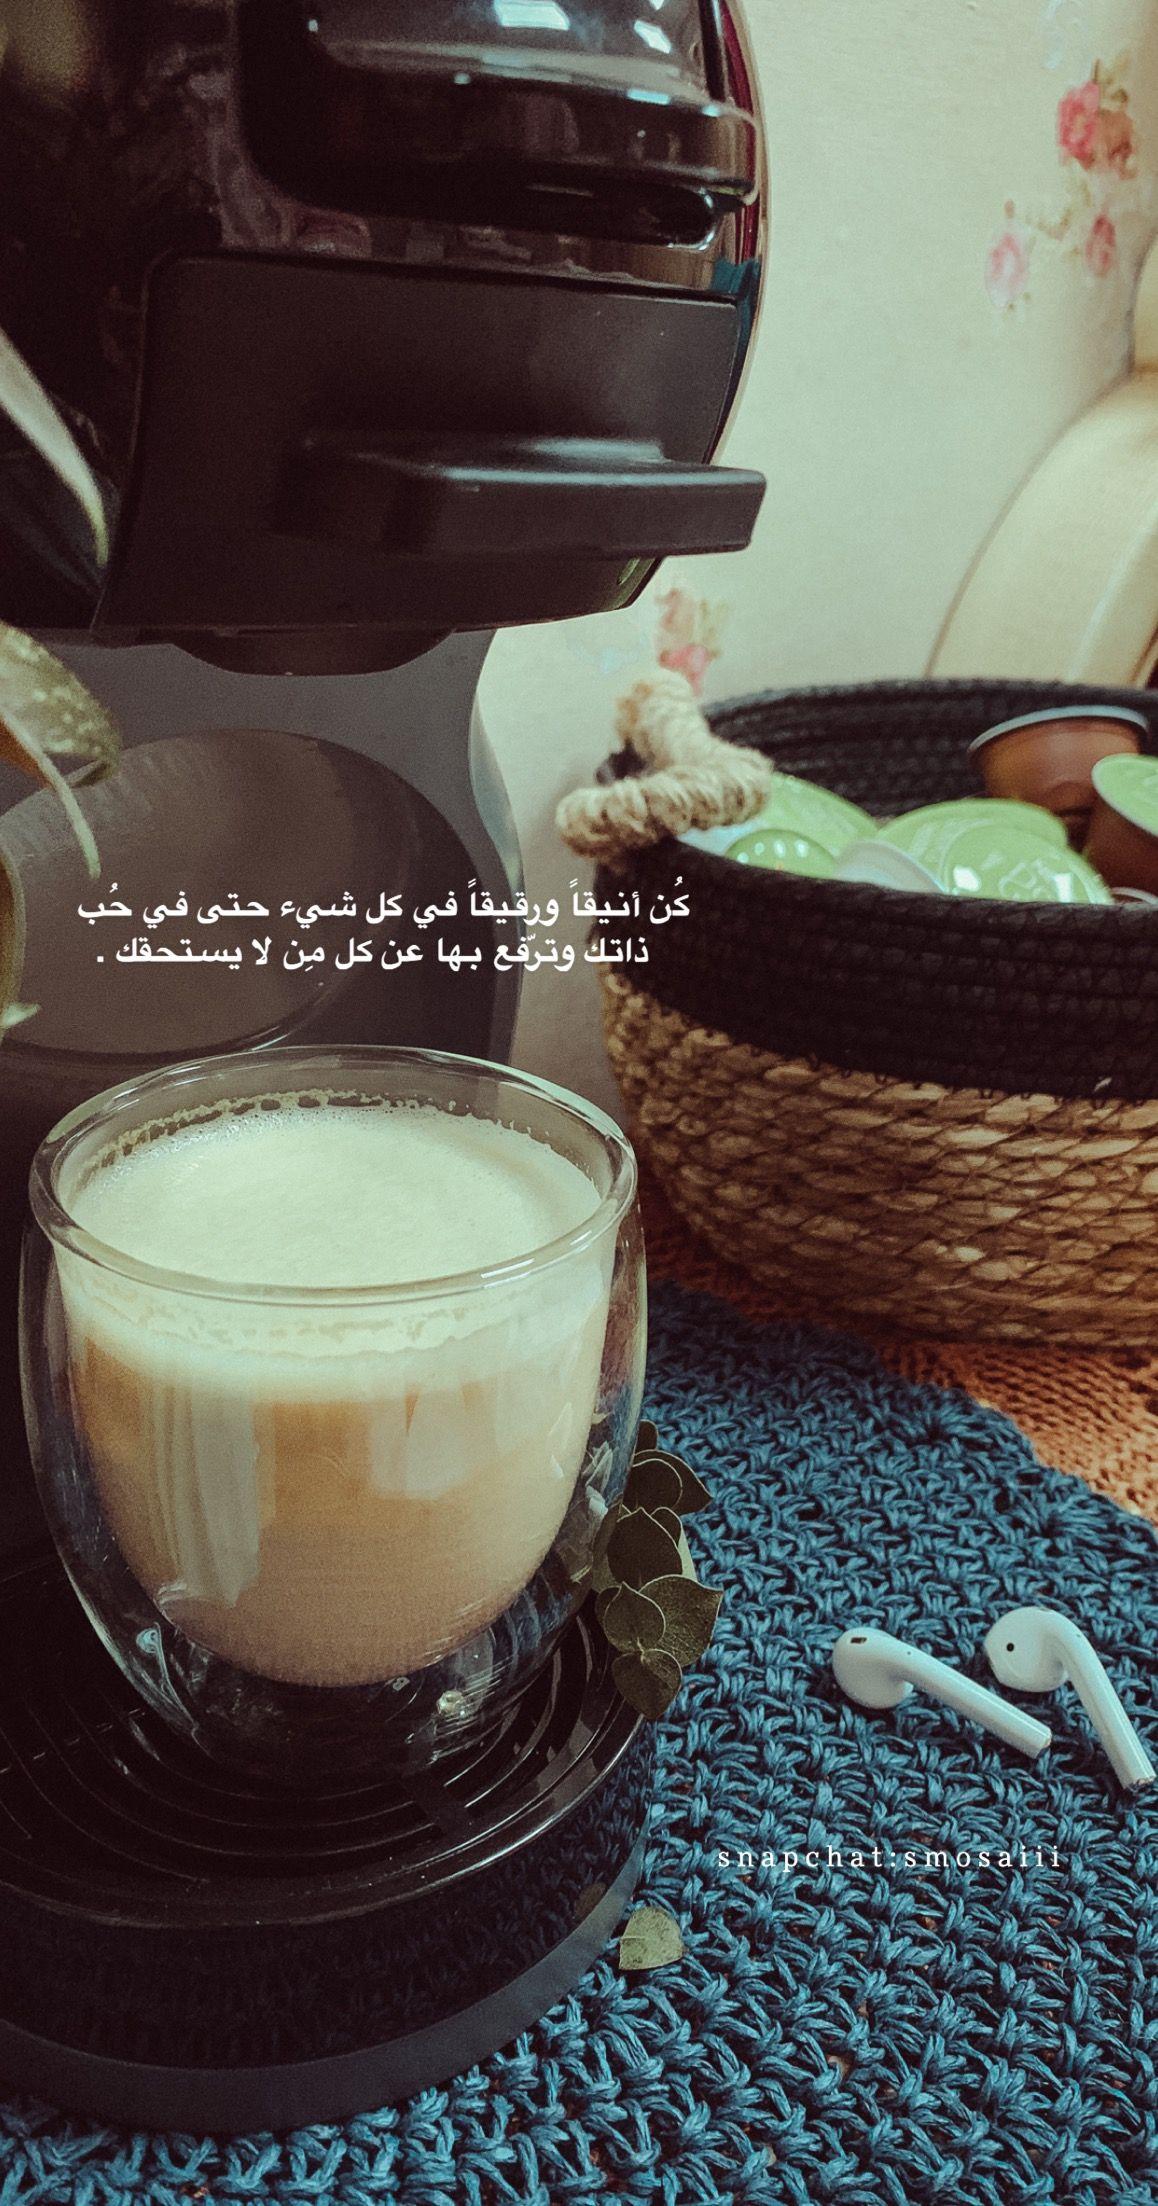 Snapchat Smosaiii Arabic Love Quotes Words Stylish Girls Photos